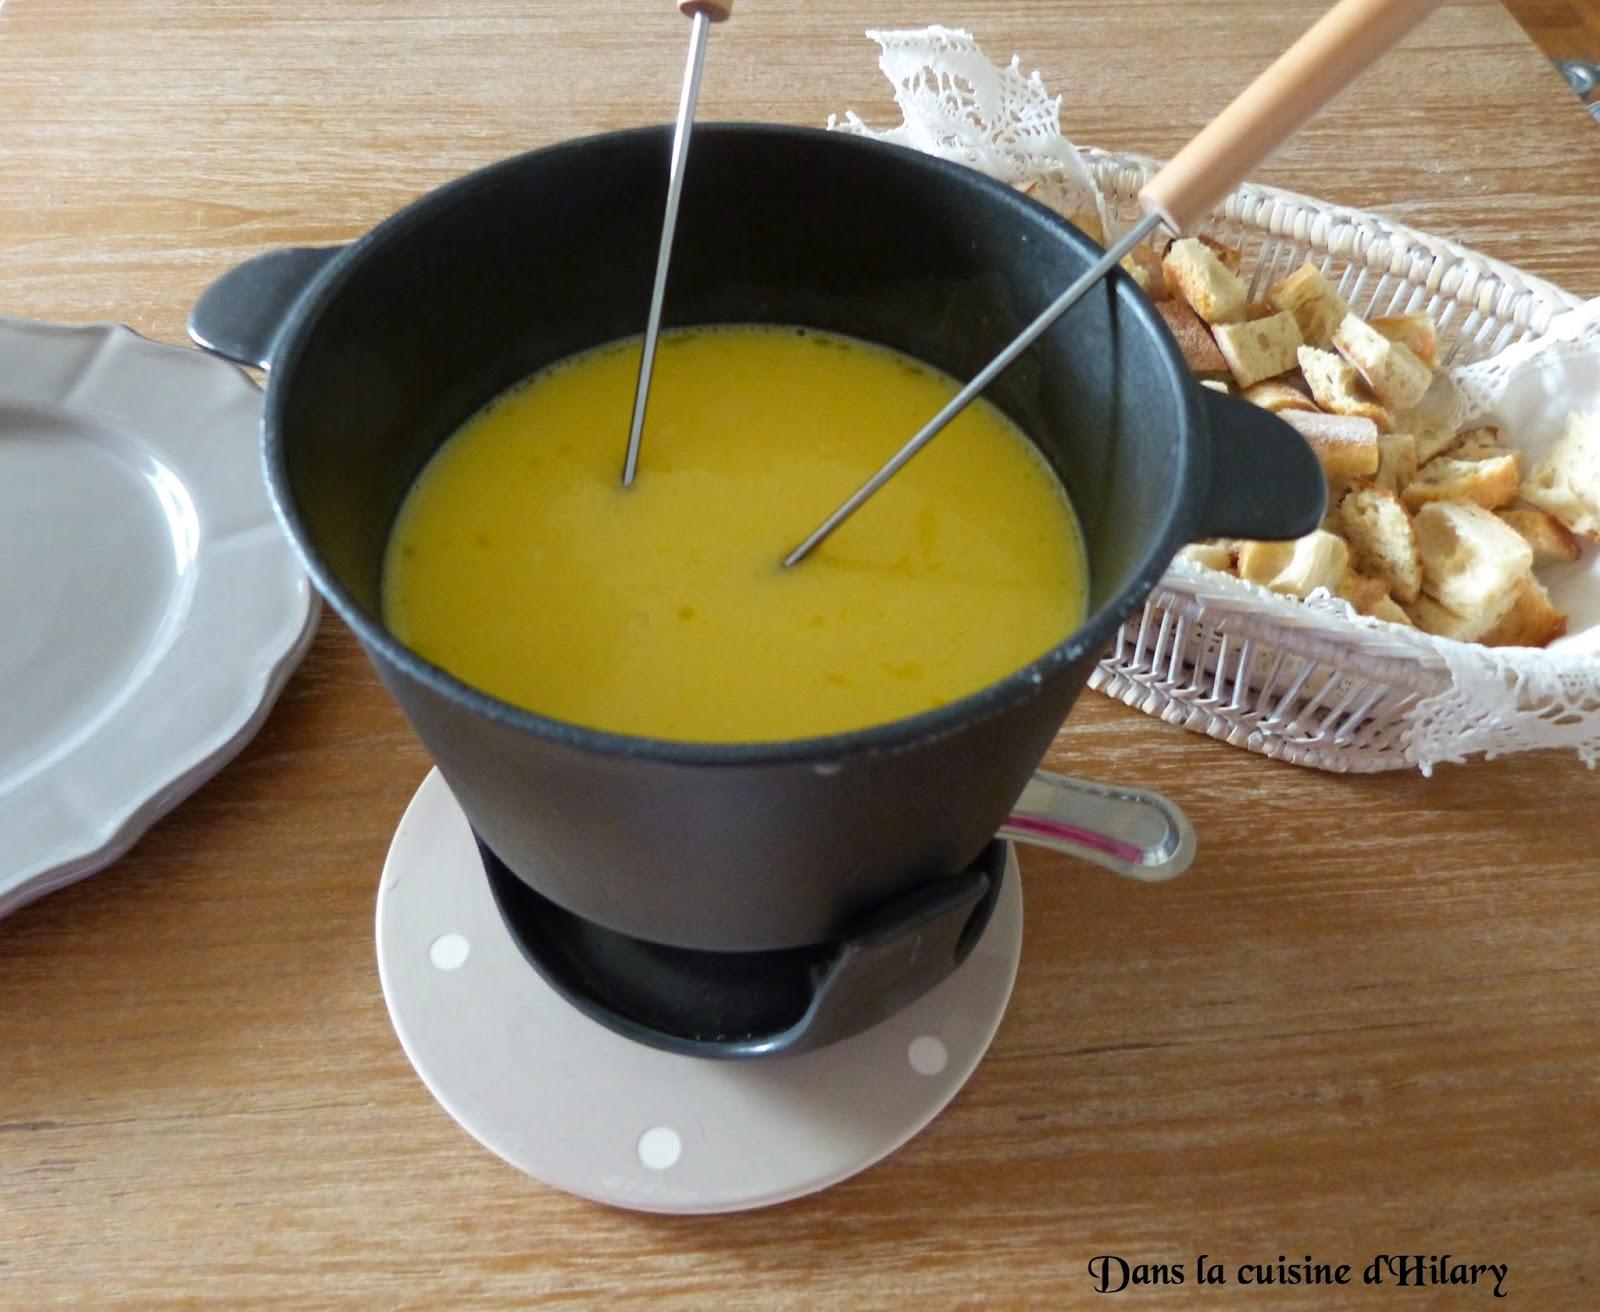 dans la cuisine d 39 hilary fondue savoyarde cheese fondue. Black Bedroom Furniture Sets. Home Design Ideas